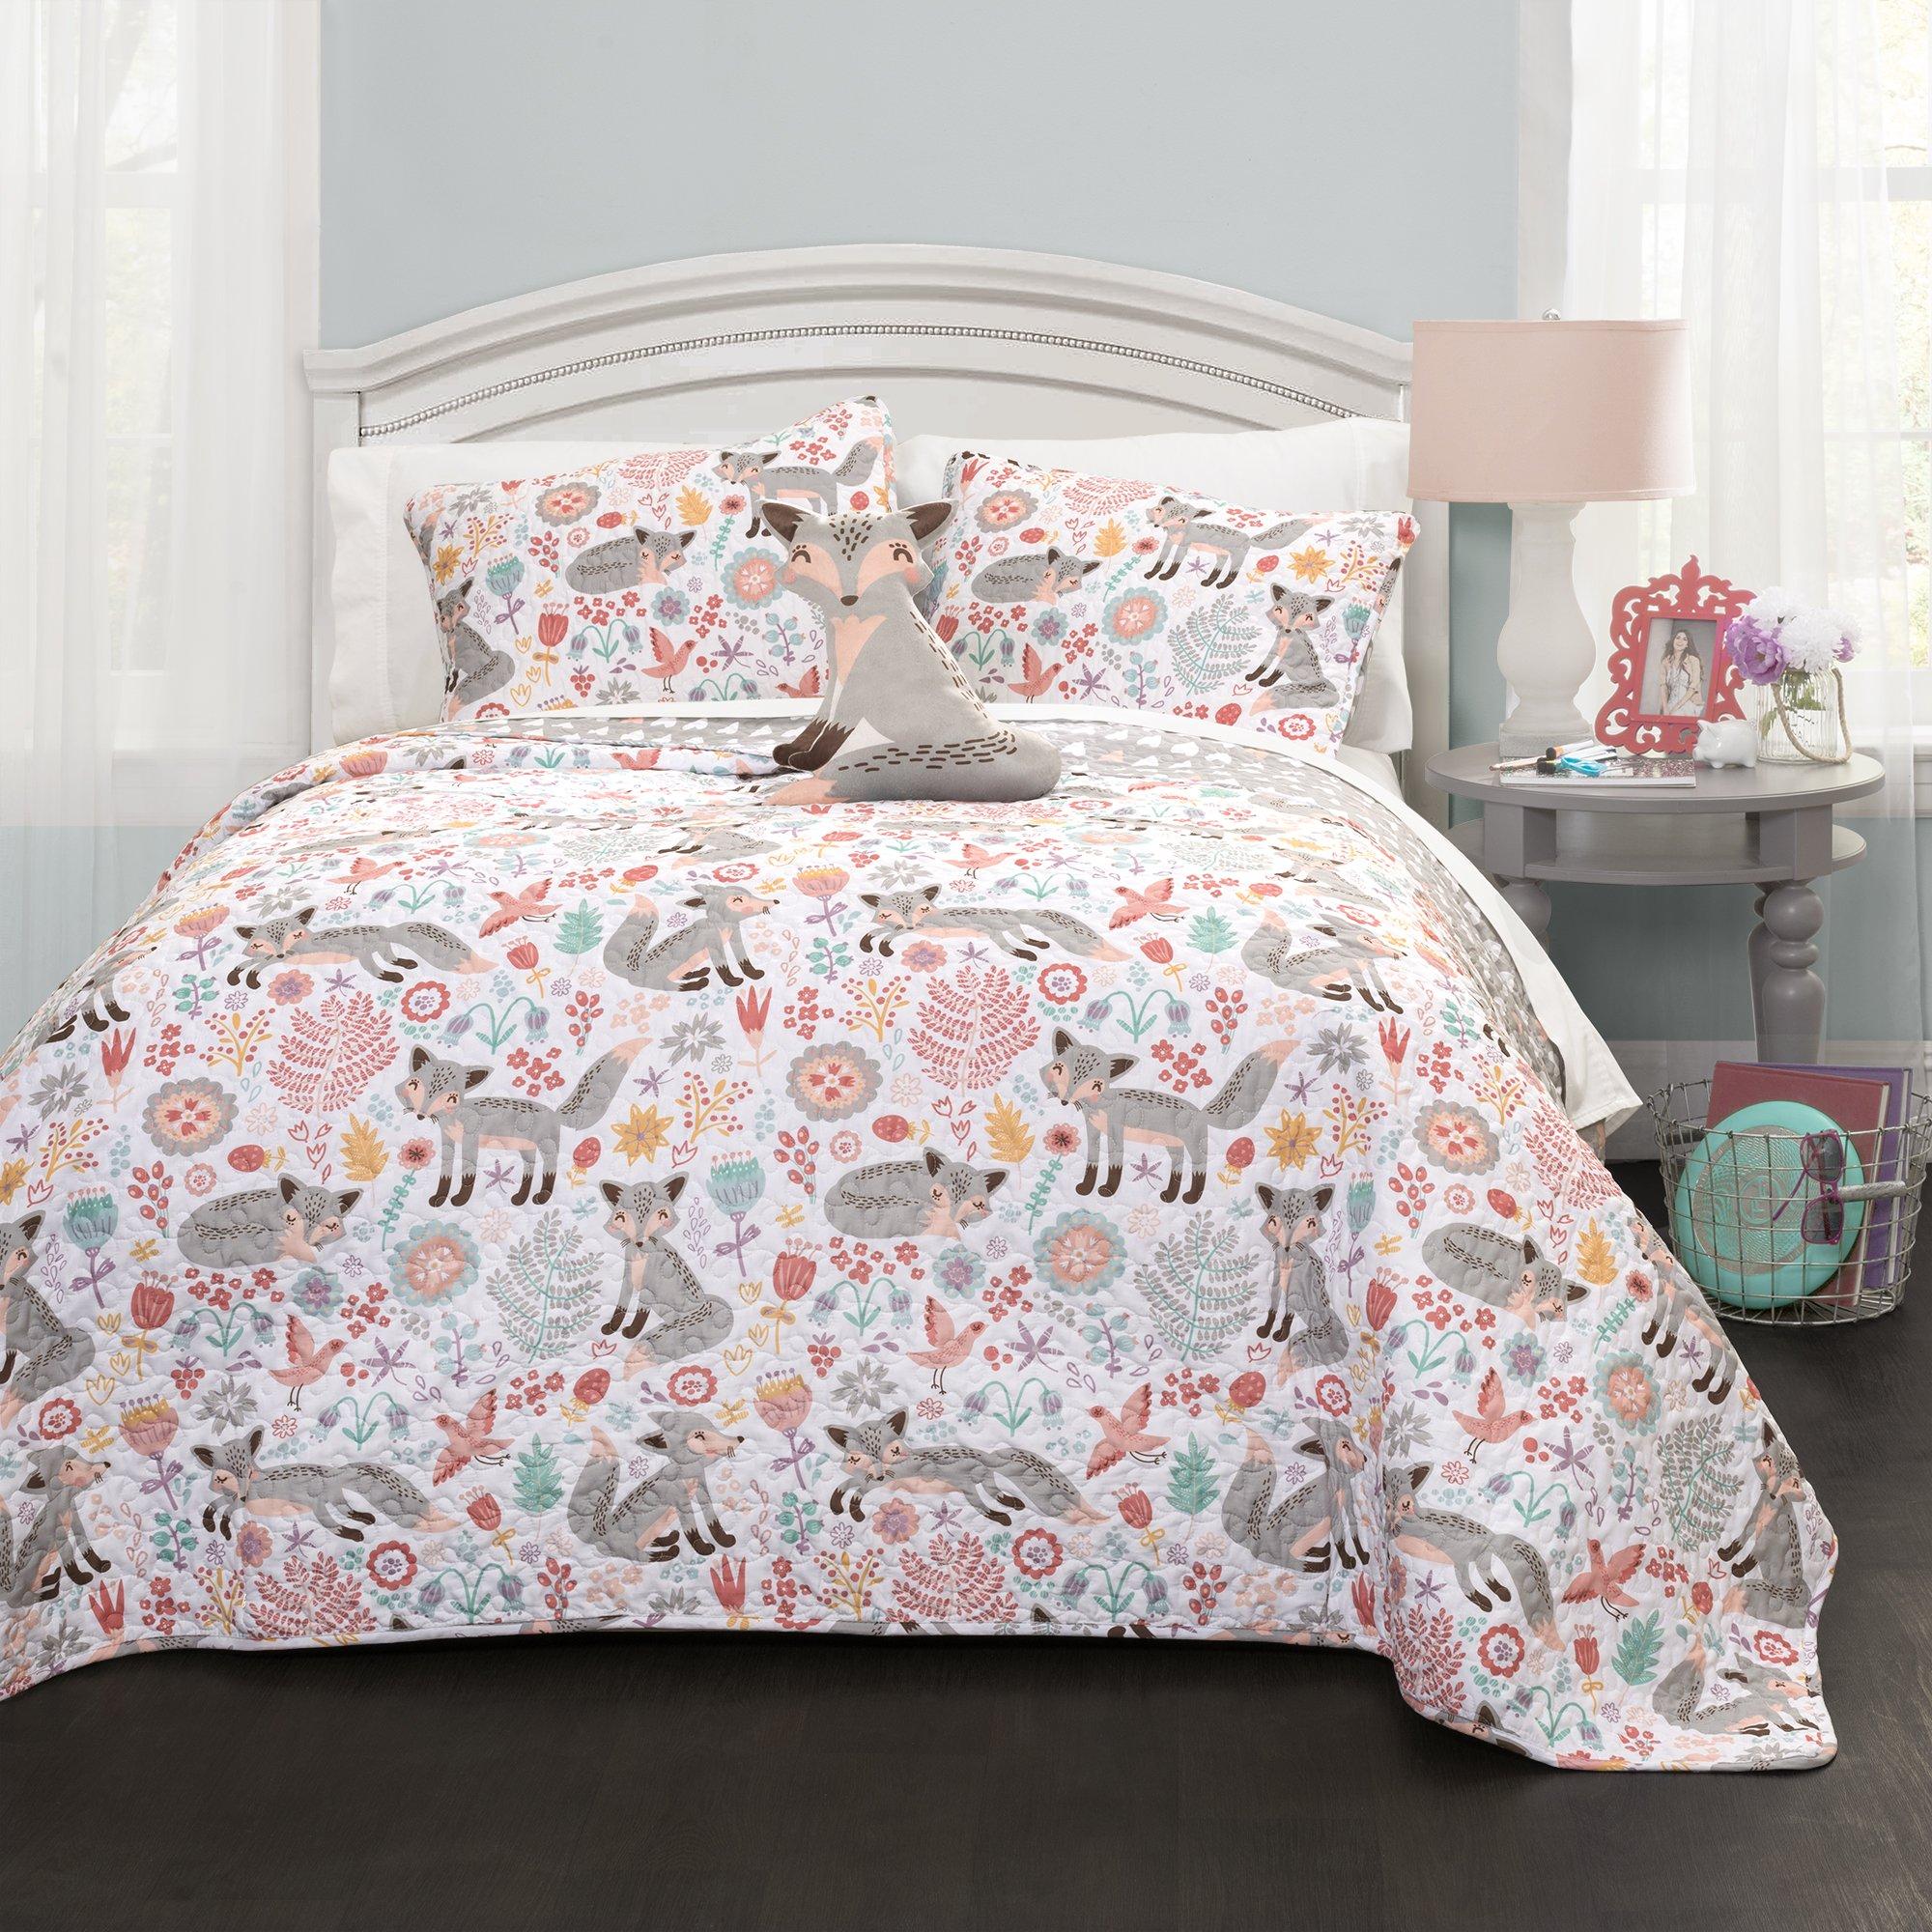 Lush Decor 16T000853 3 Piece Pixie Fox Quilt Set, Twin, Gray/Pink